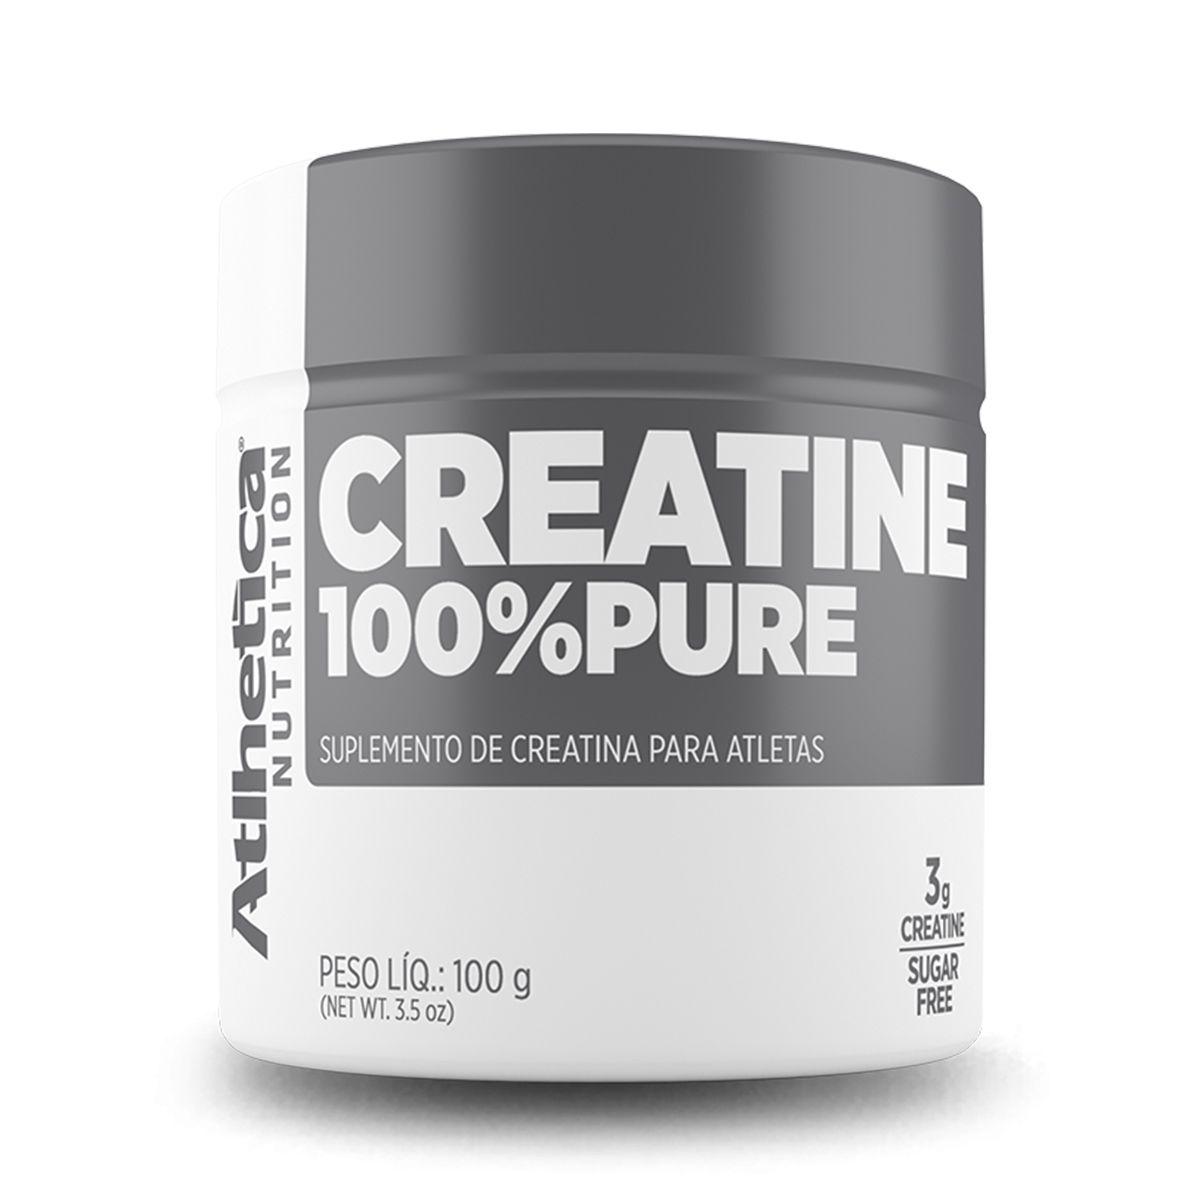 Creatina 100% Pure - 100g - Atlhetica